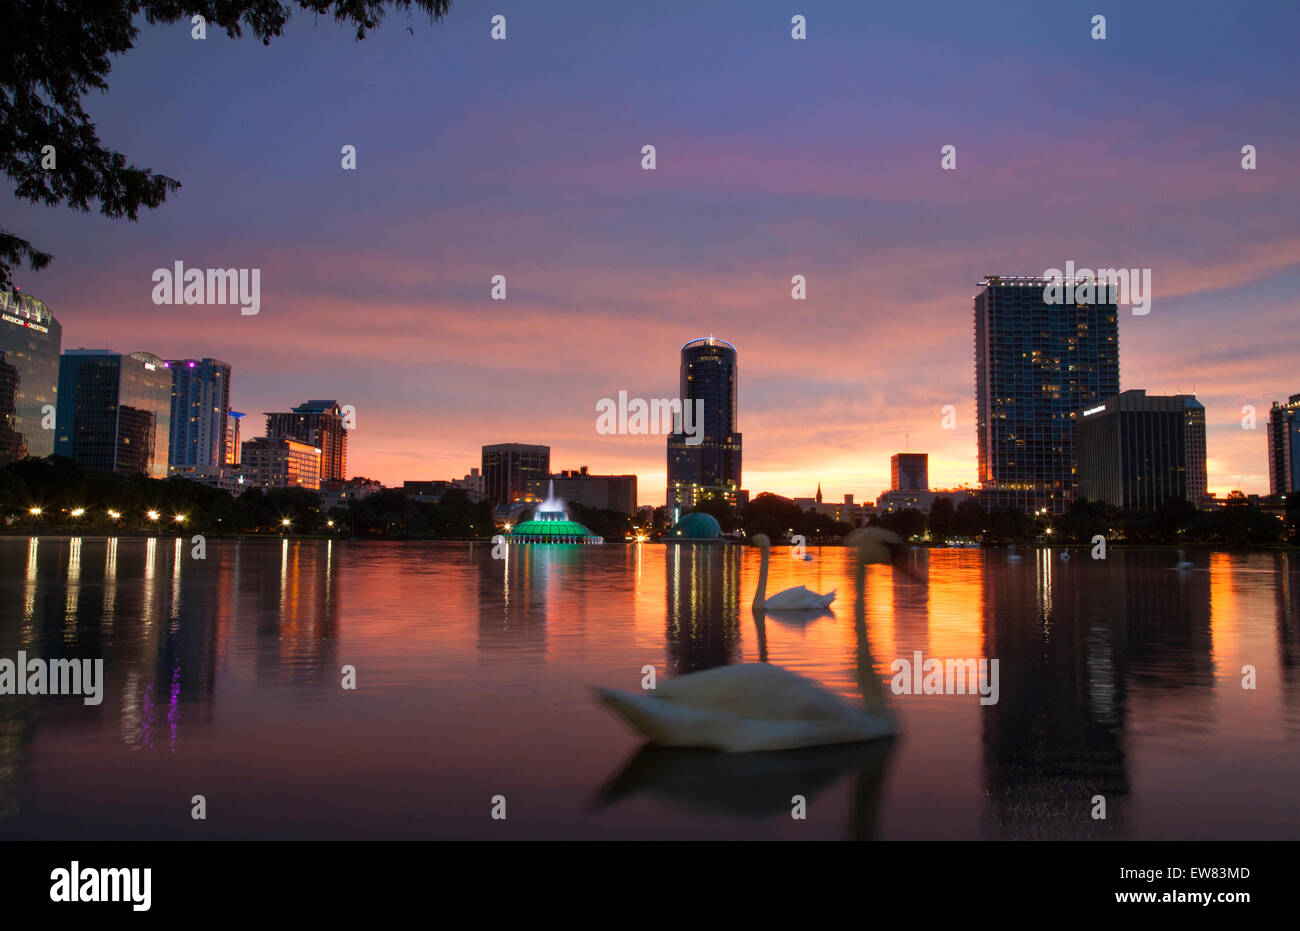 Sunset at Lake Eola in downtown Orlando Florida - Stock Image